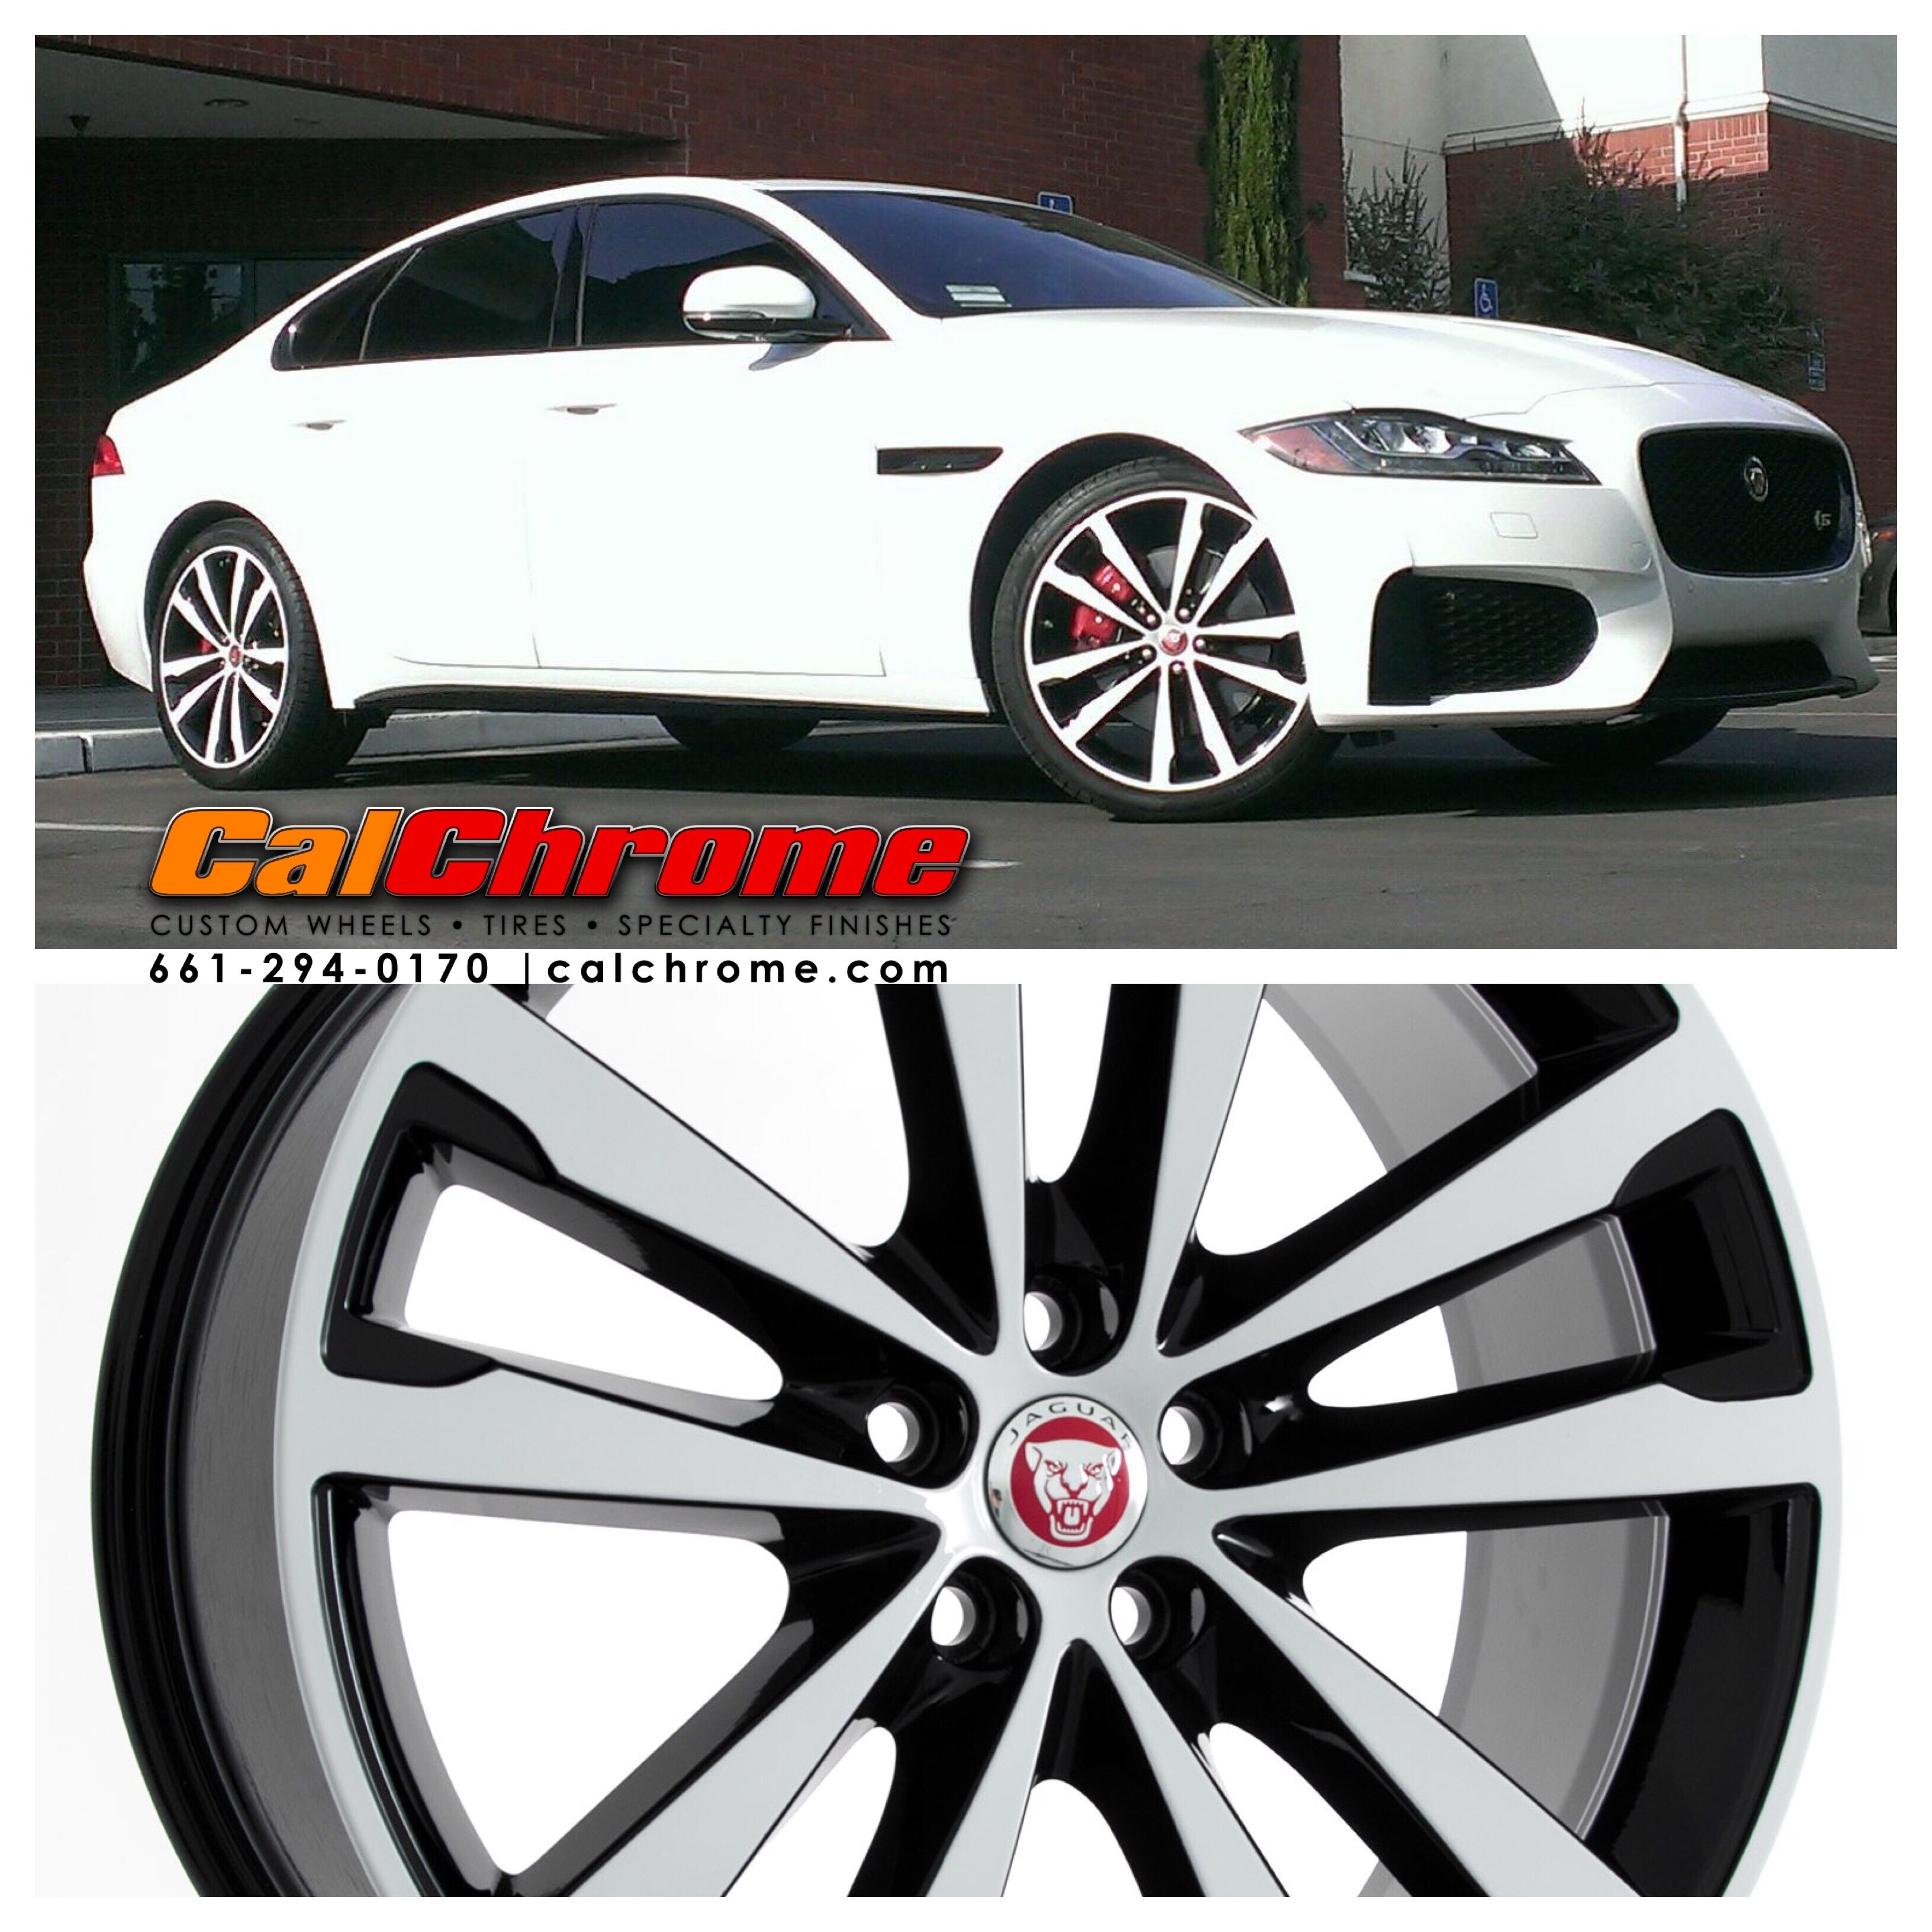 hd forgiatos youtube watch wheels pearl on xf white jaguar